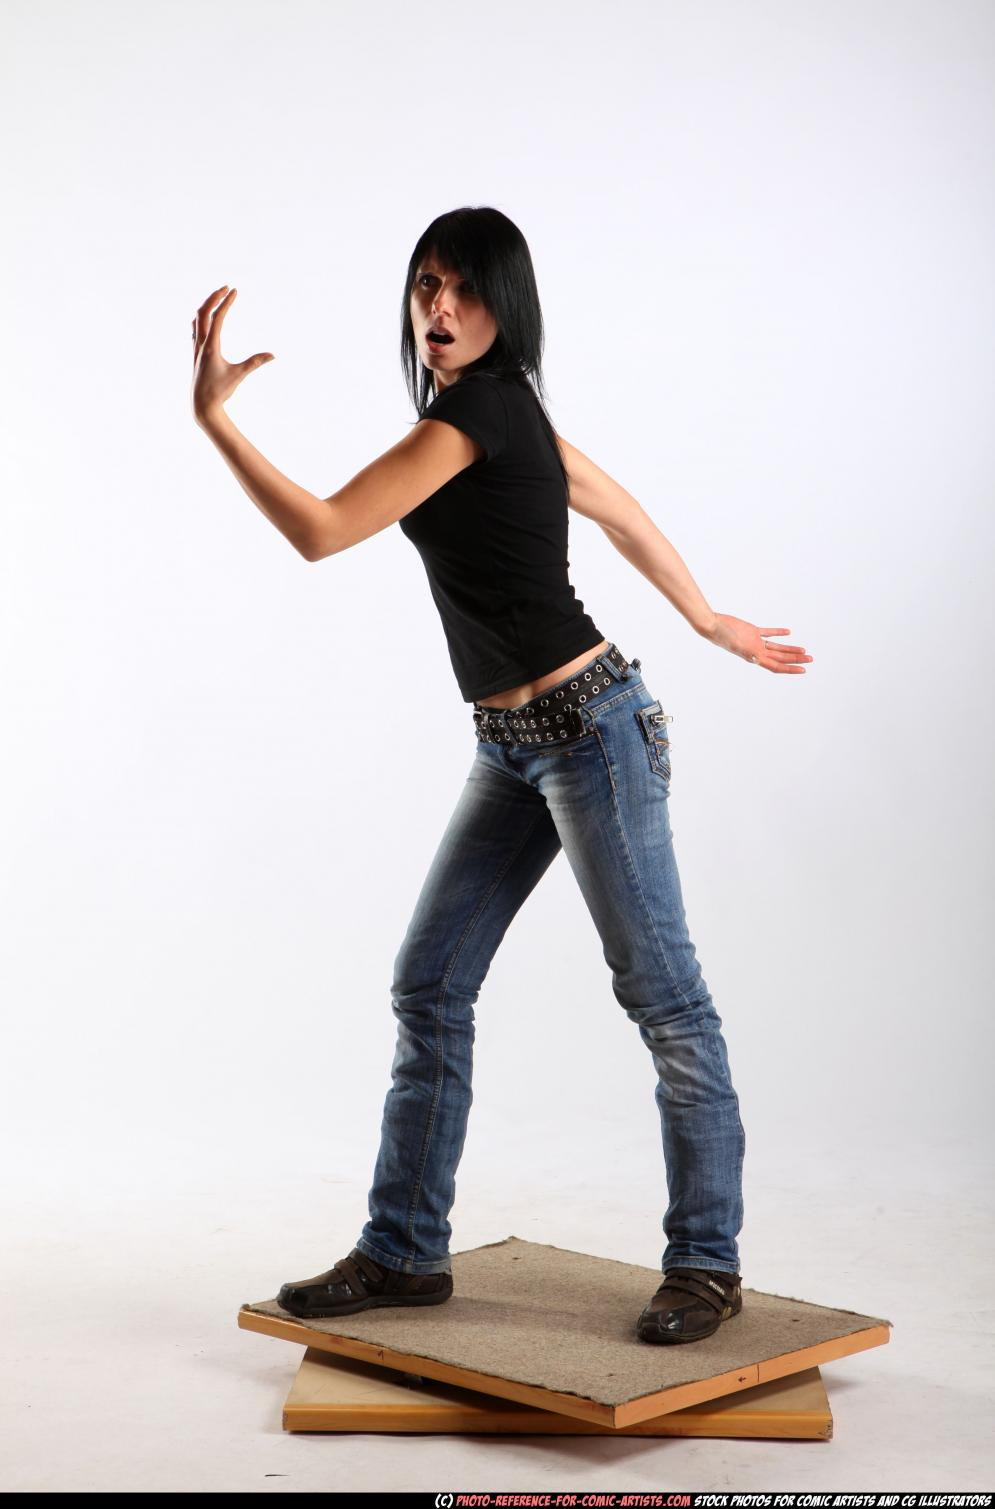 Image from Comic Reference - Female Anatomy - 2010_07_silvia_magic_trick_01.jpg